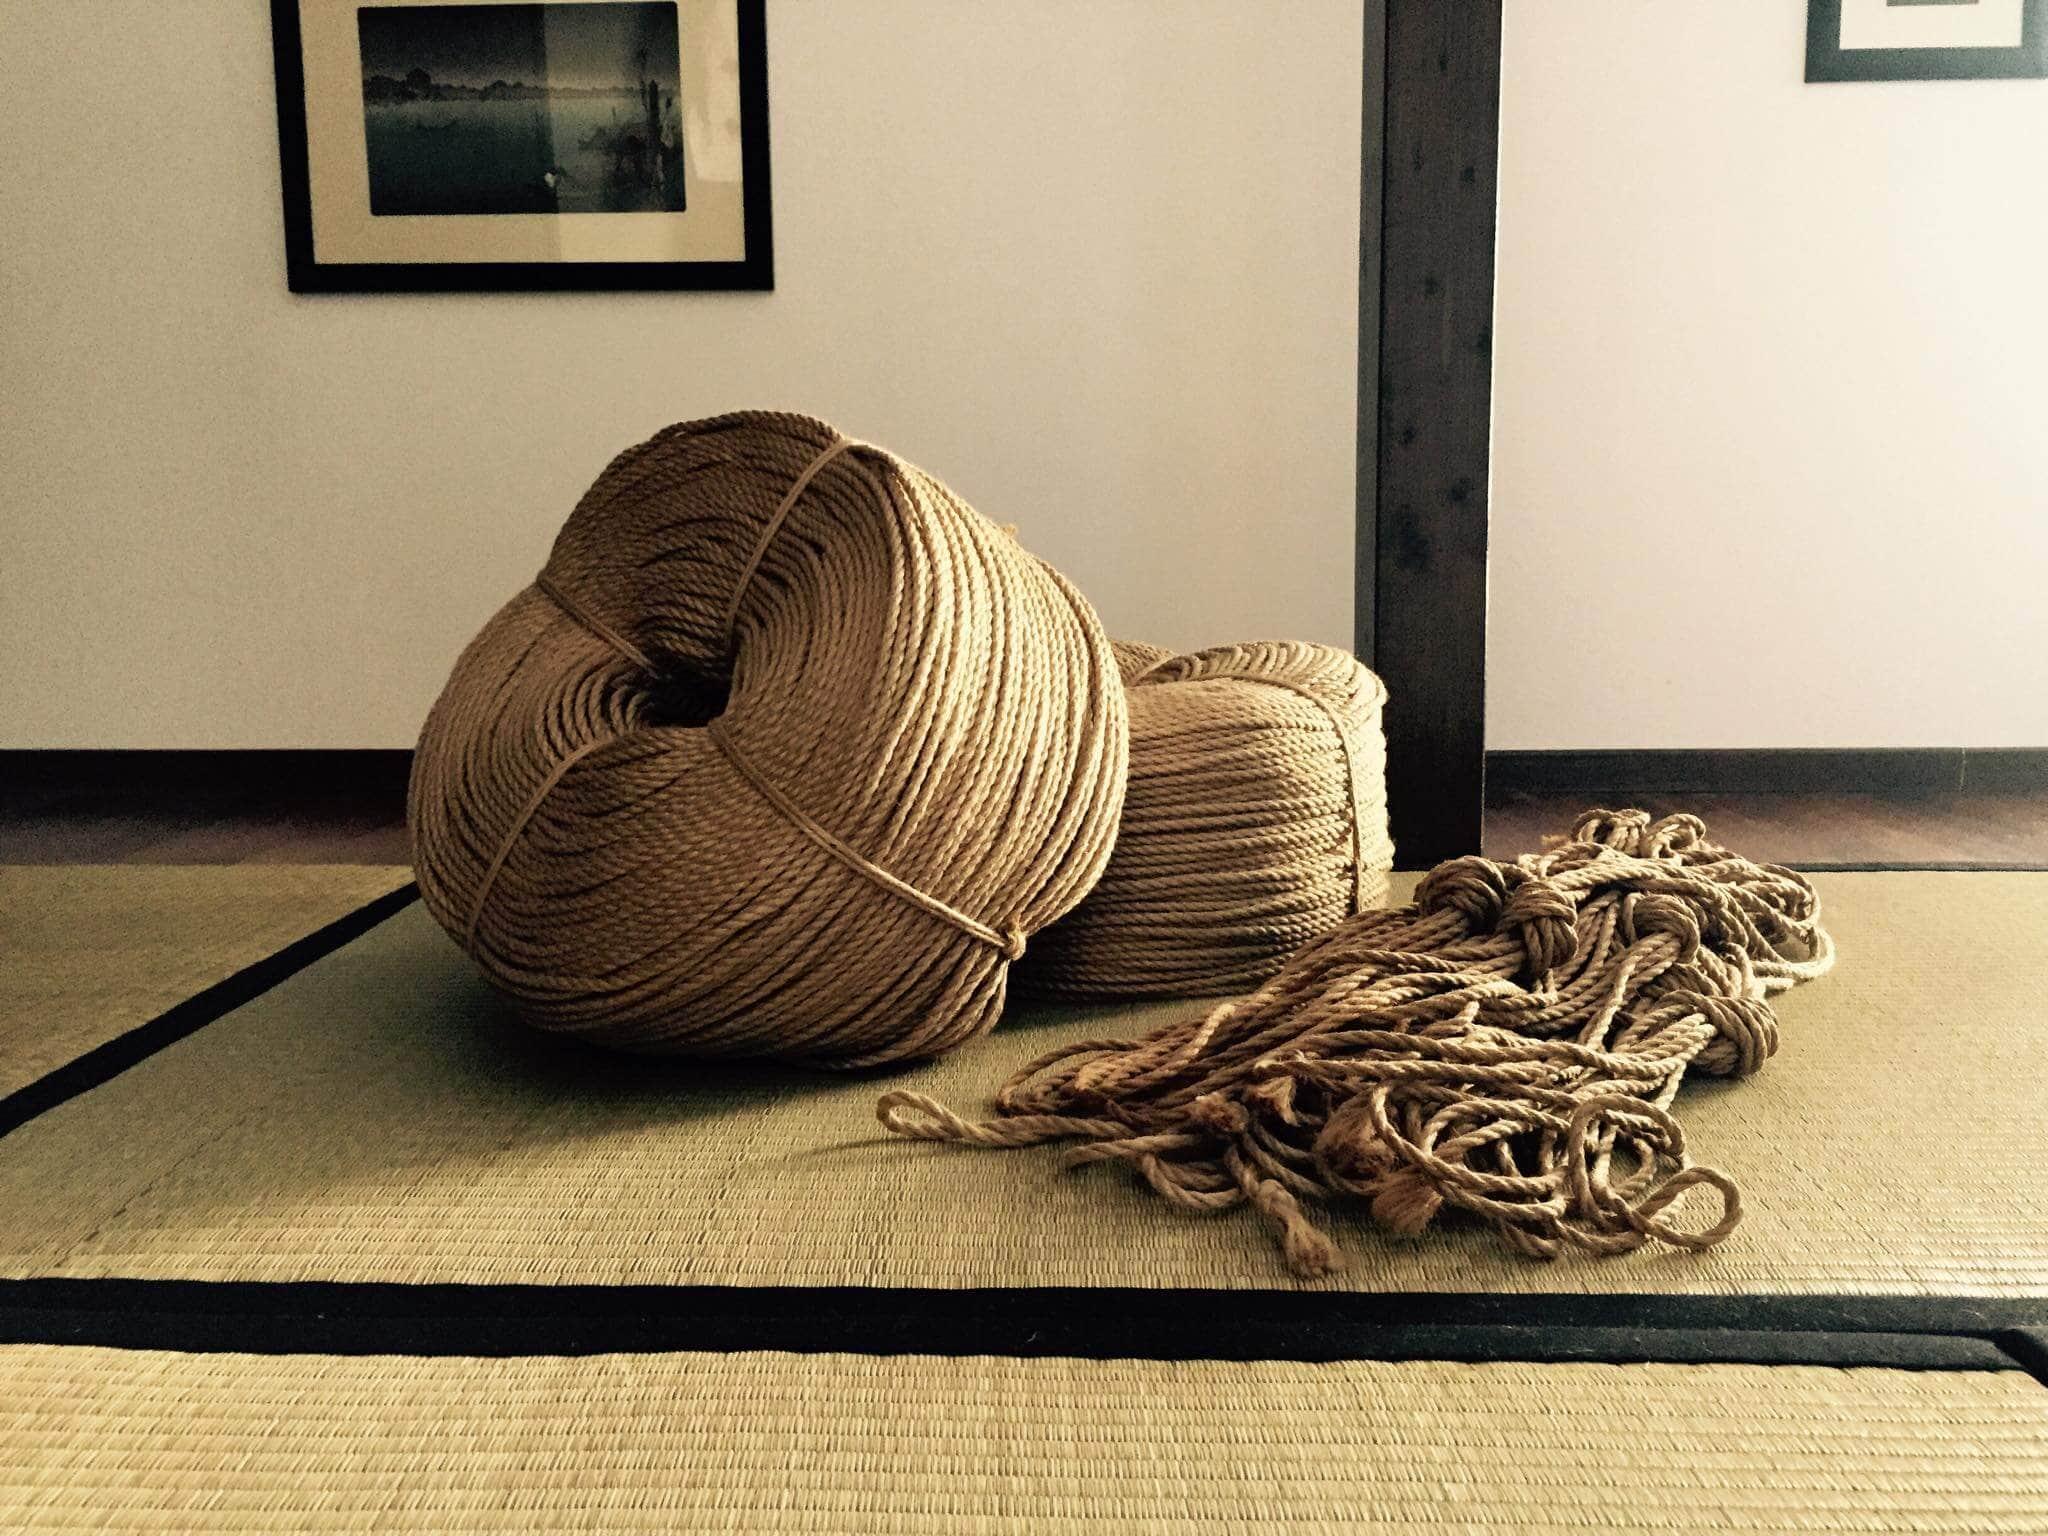 corde-bondage-shibari-kinbaku